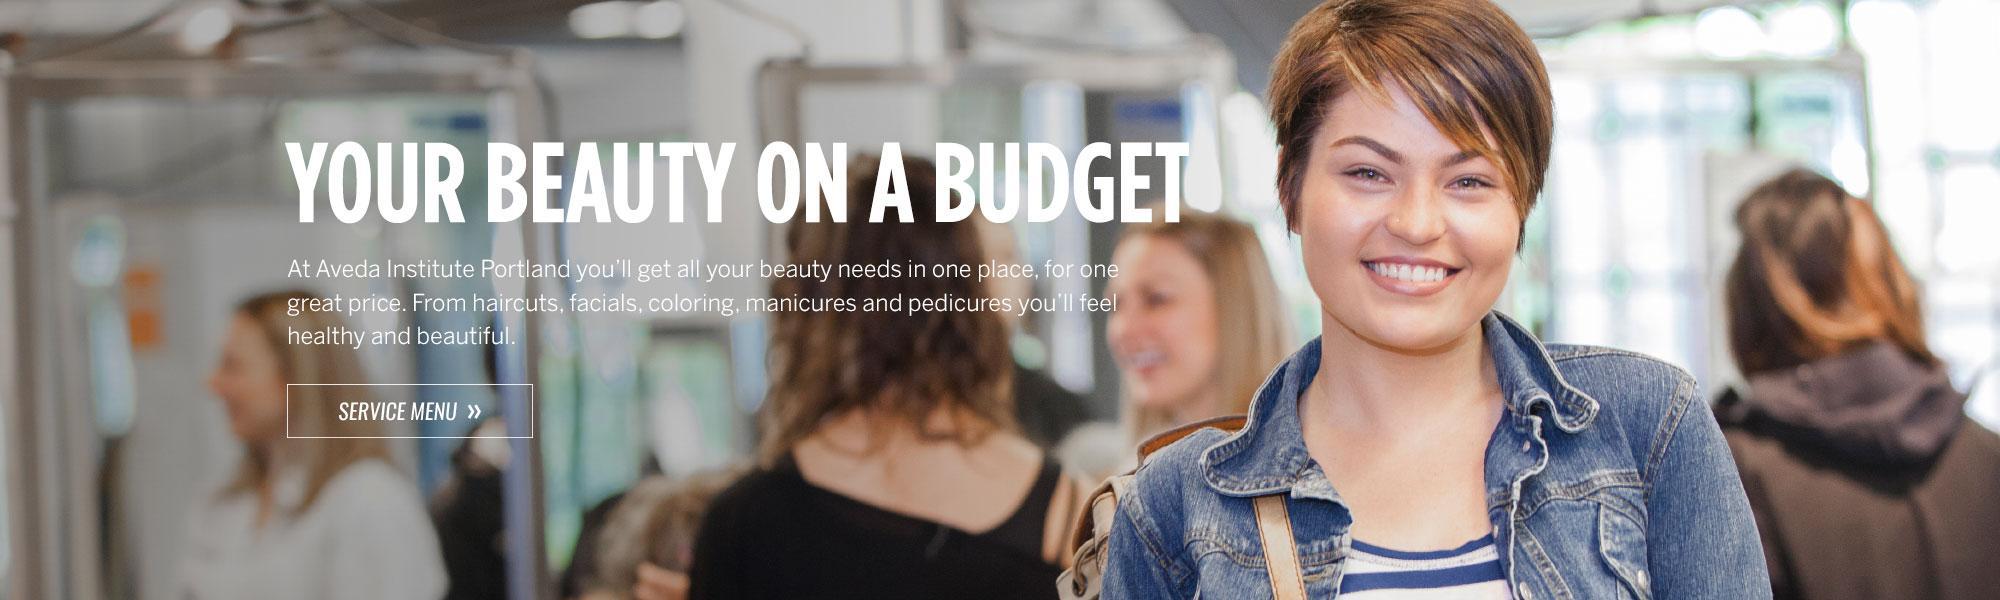 Beauty on a Budget - Aveda Institute Portland